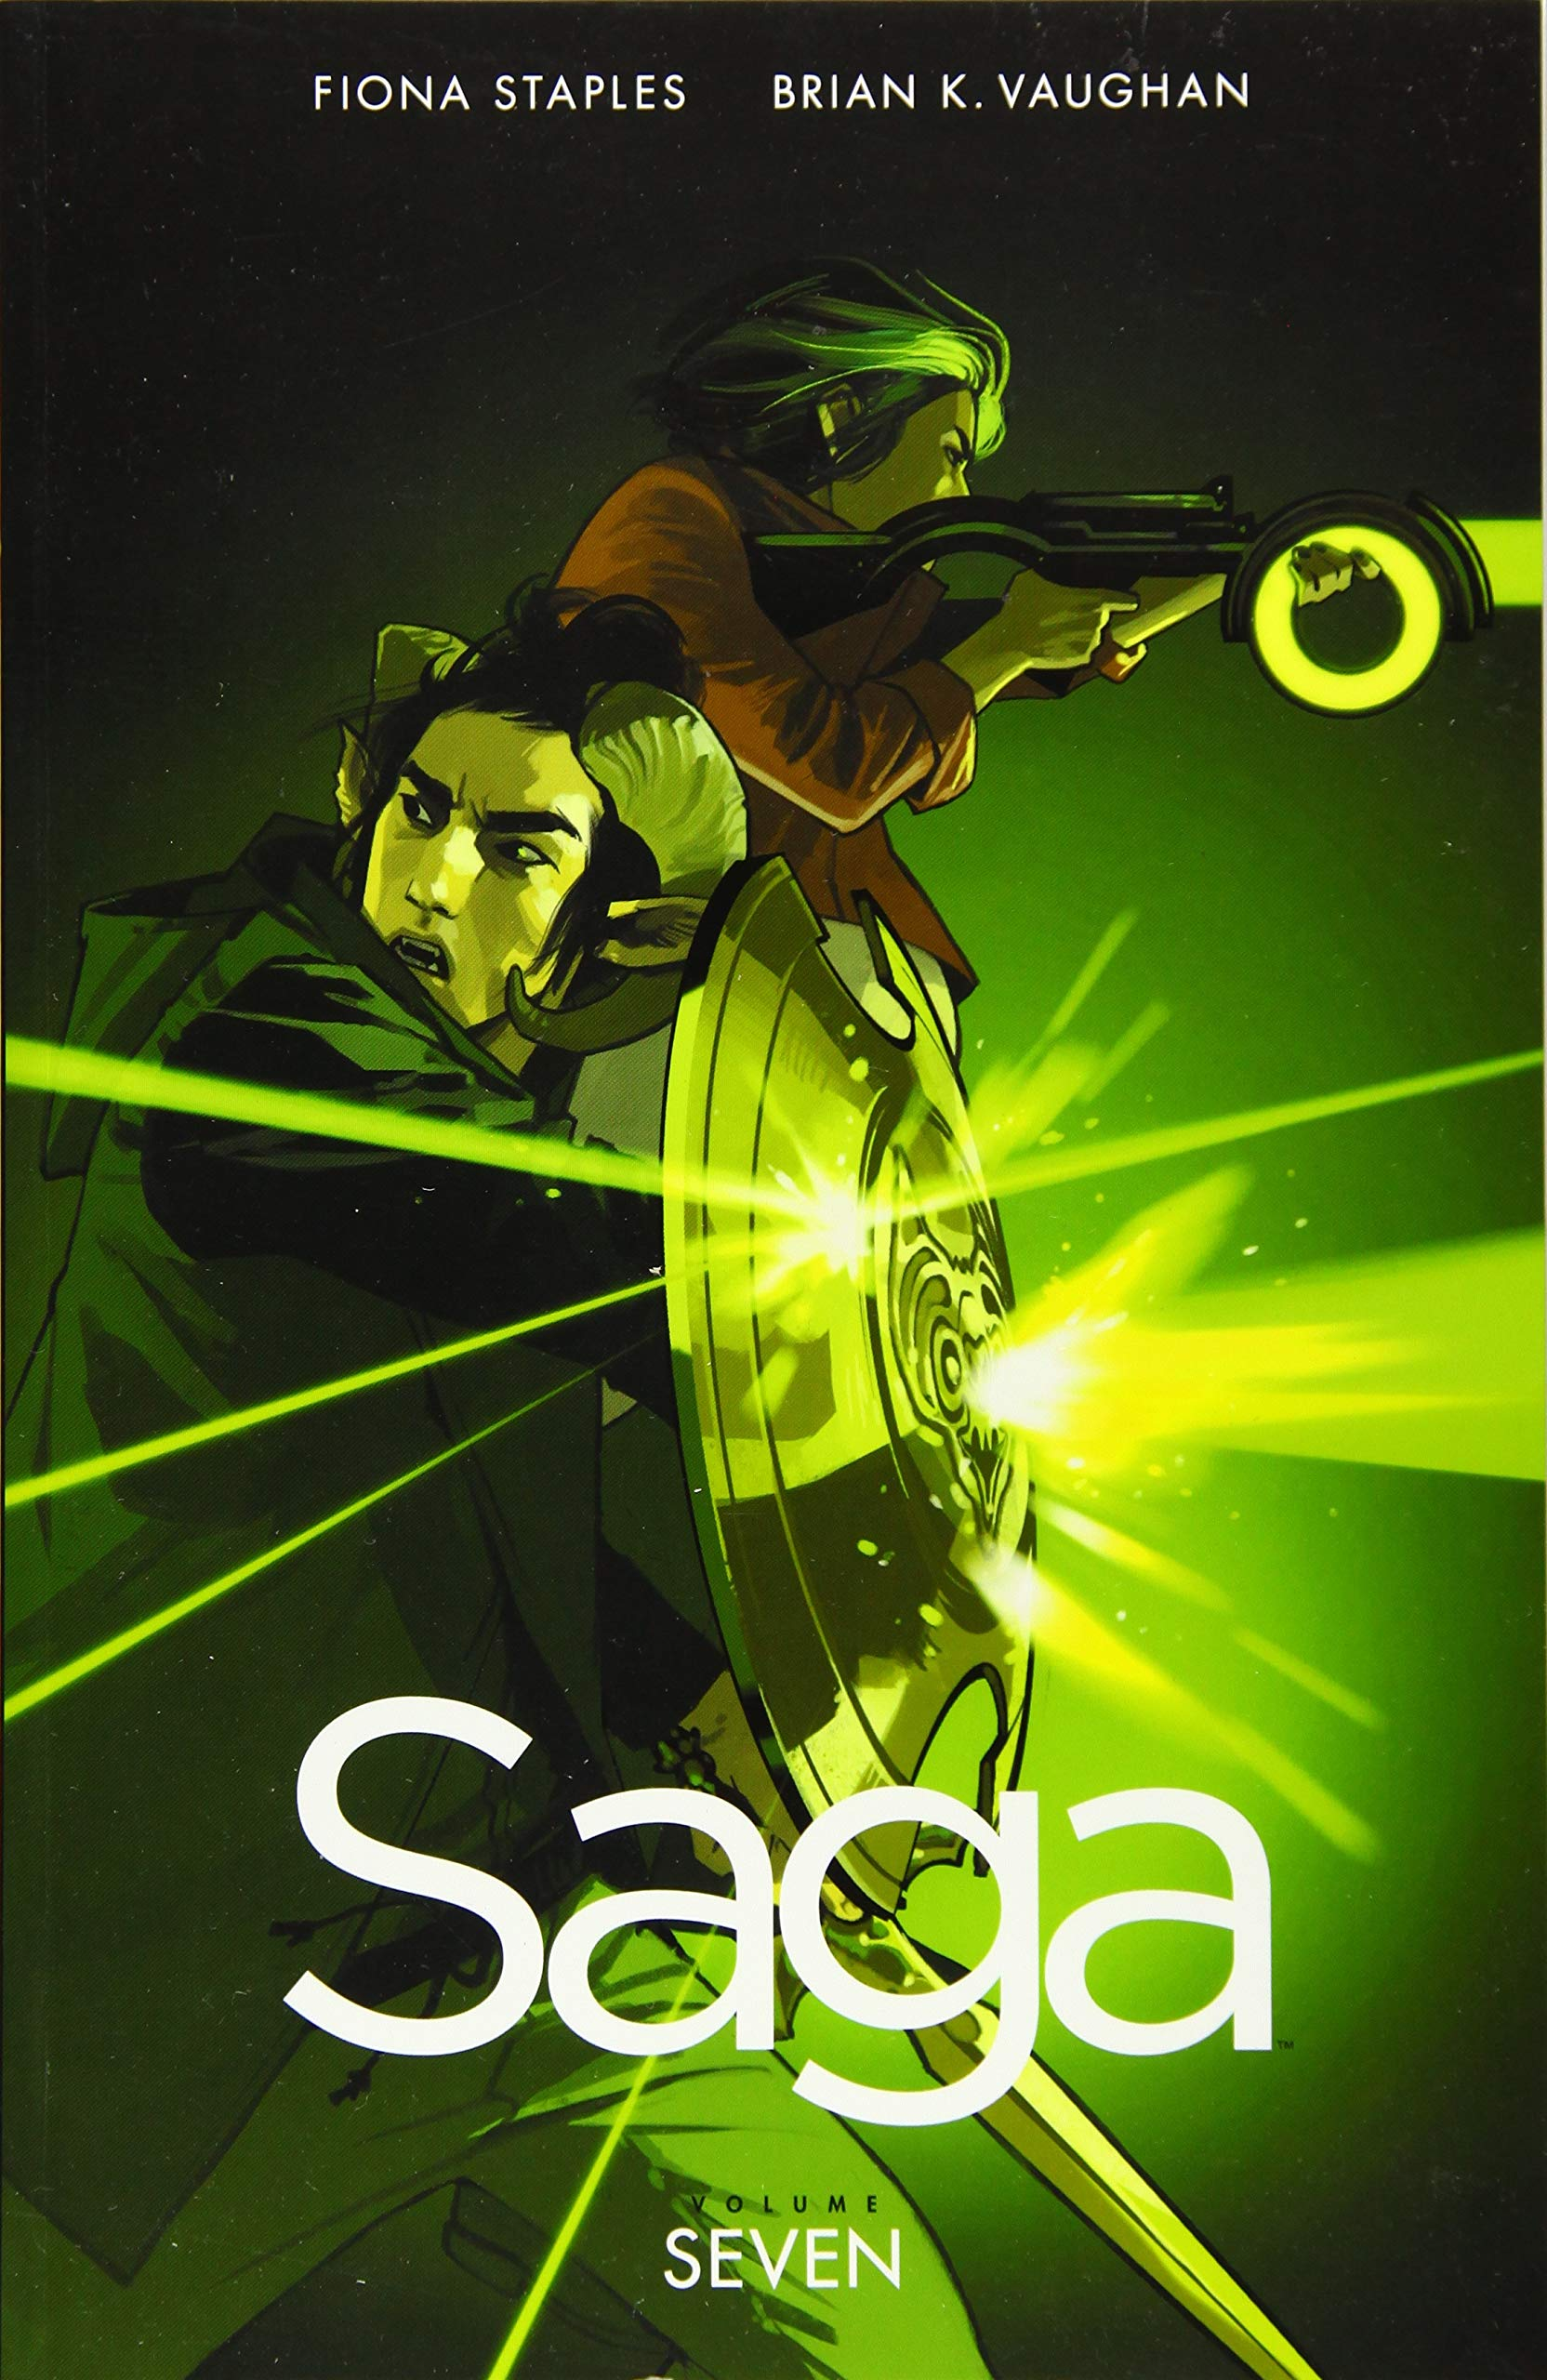 Amazon.com: Saga Volume 7 (9781534300606): Vaughan, Brian K, Staples,  Fiona: Books